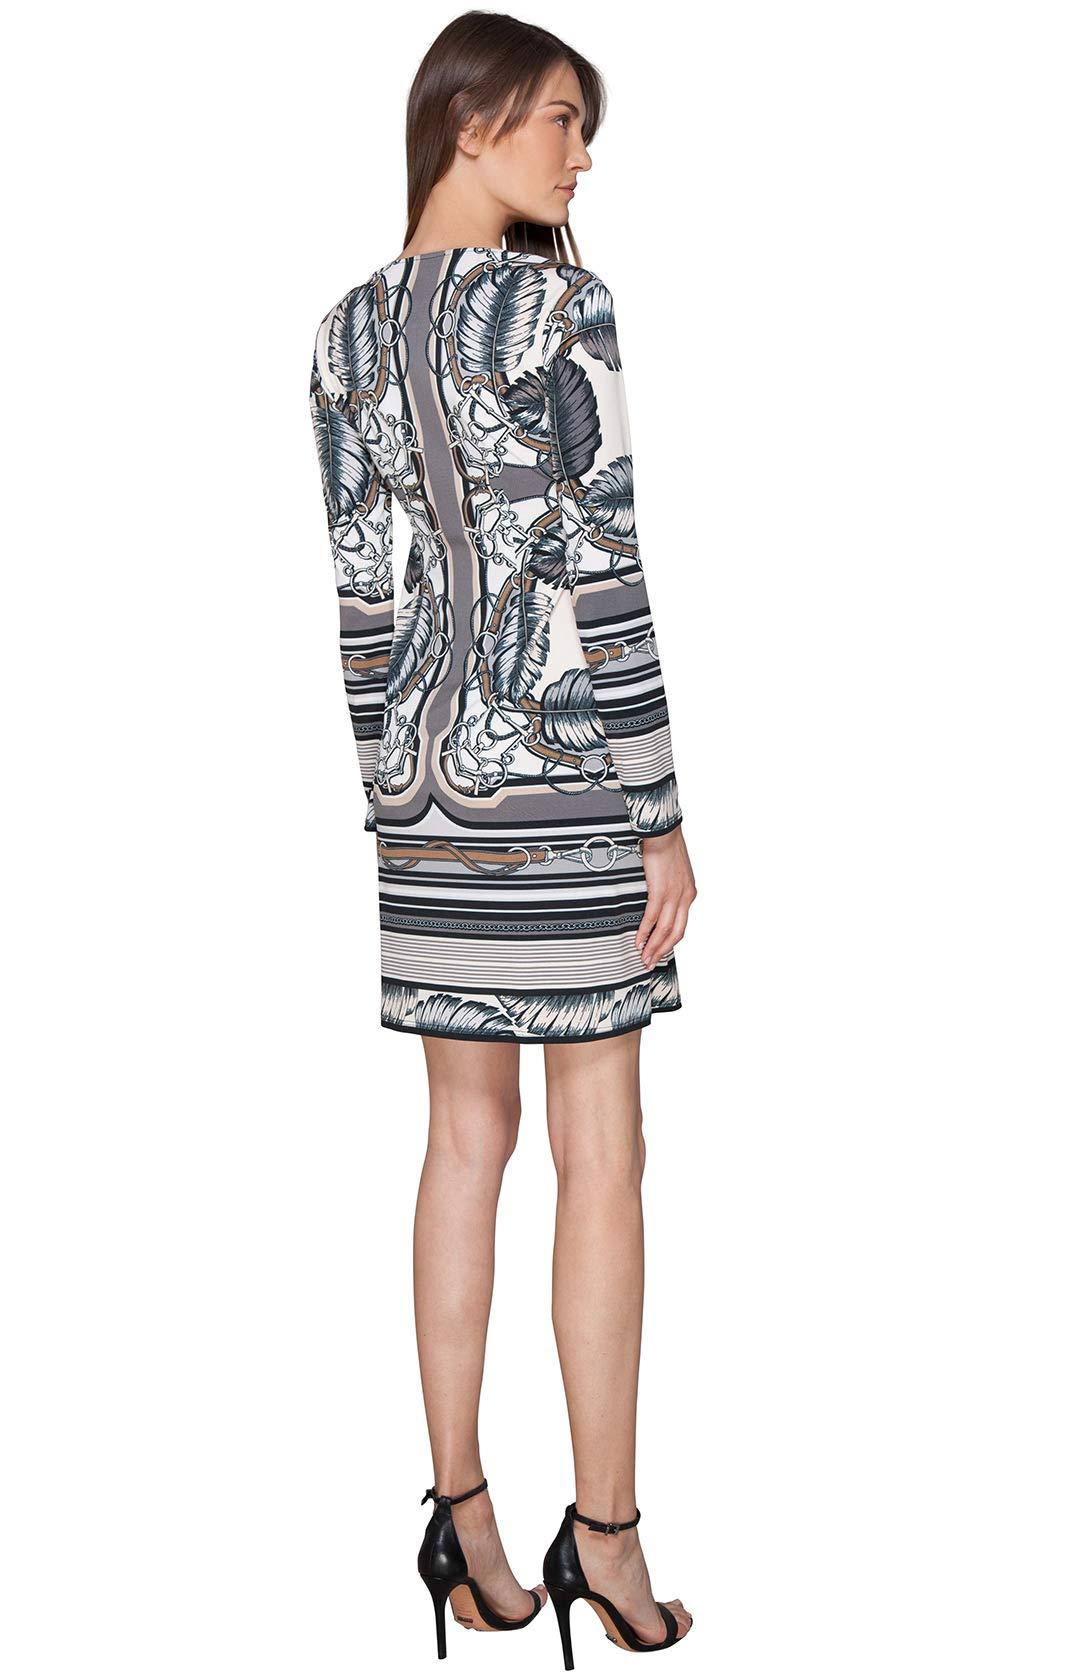 Hale Bob Magda Jersey Dress by Hale Bob (Image #2)